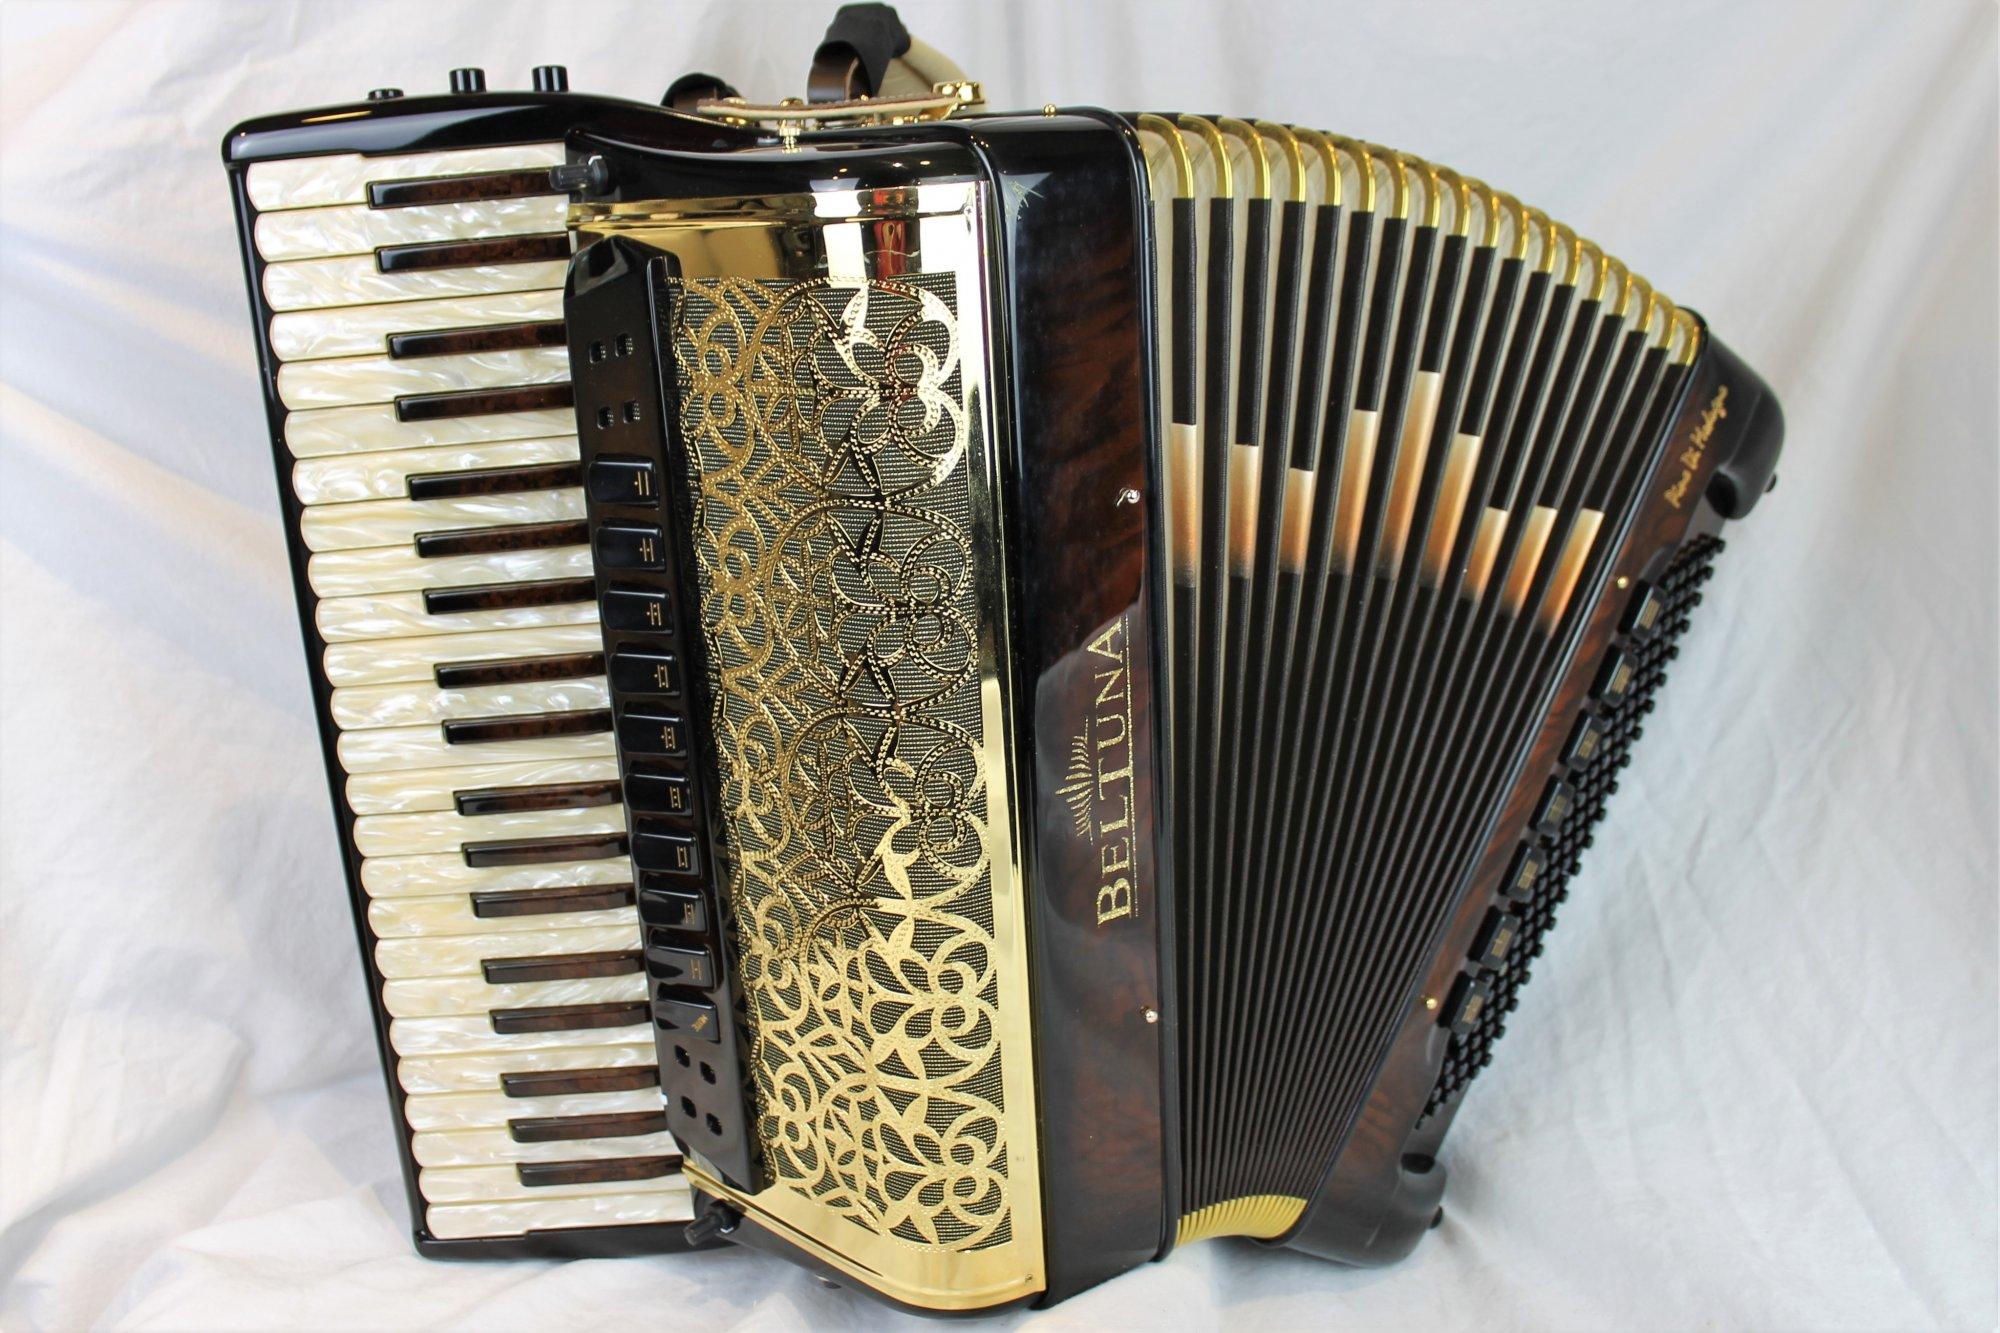 Like New Walnut Root Beltuna Prestige IV Pino di Madugno Piano Accordion LMMM 42 120 $8499